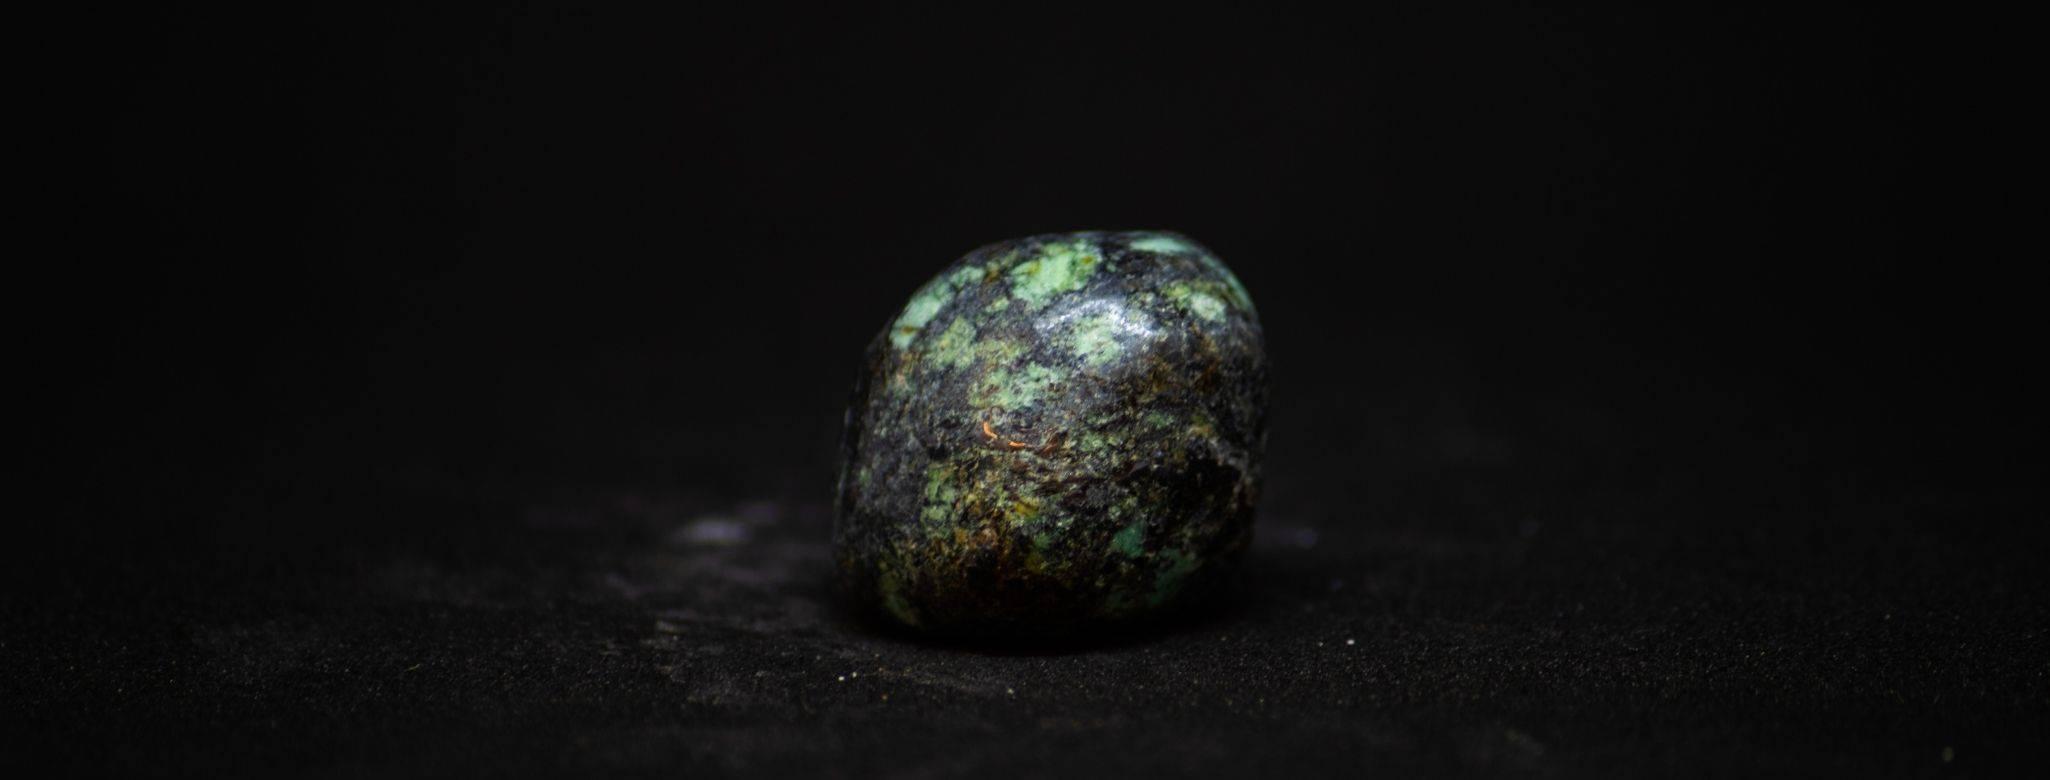 Turquoise africaine vertus